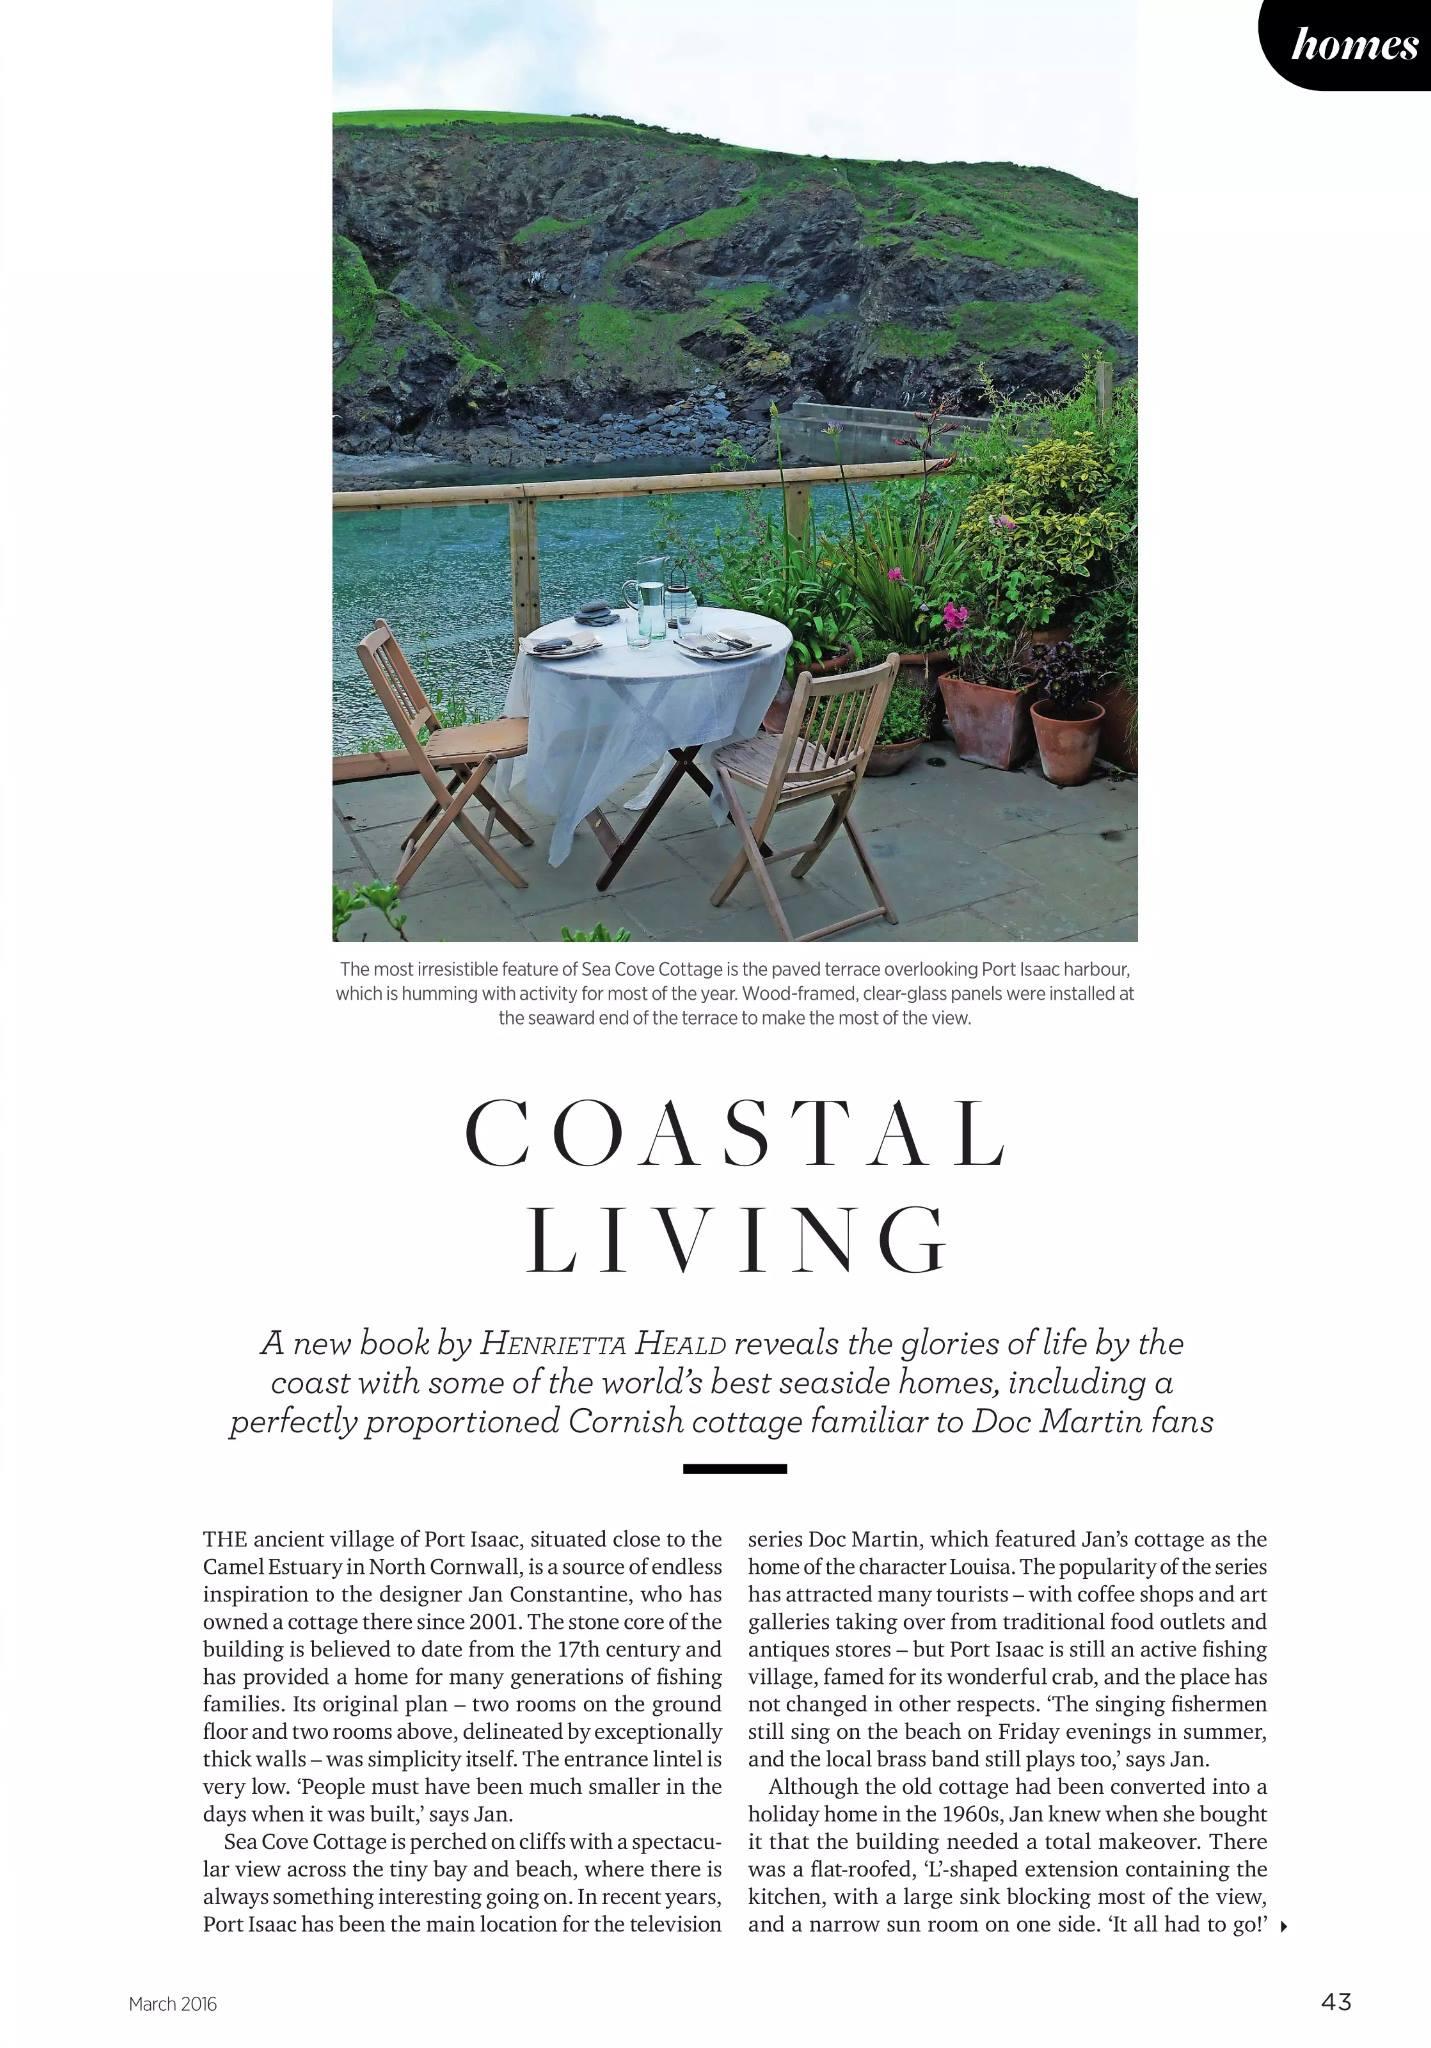 Coastal Living - March 2016